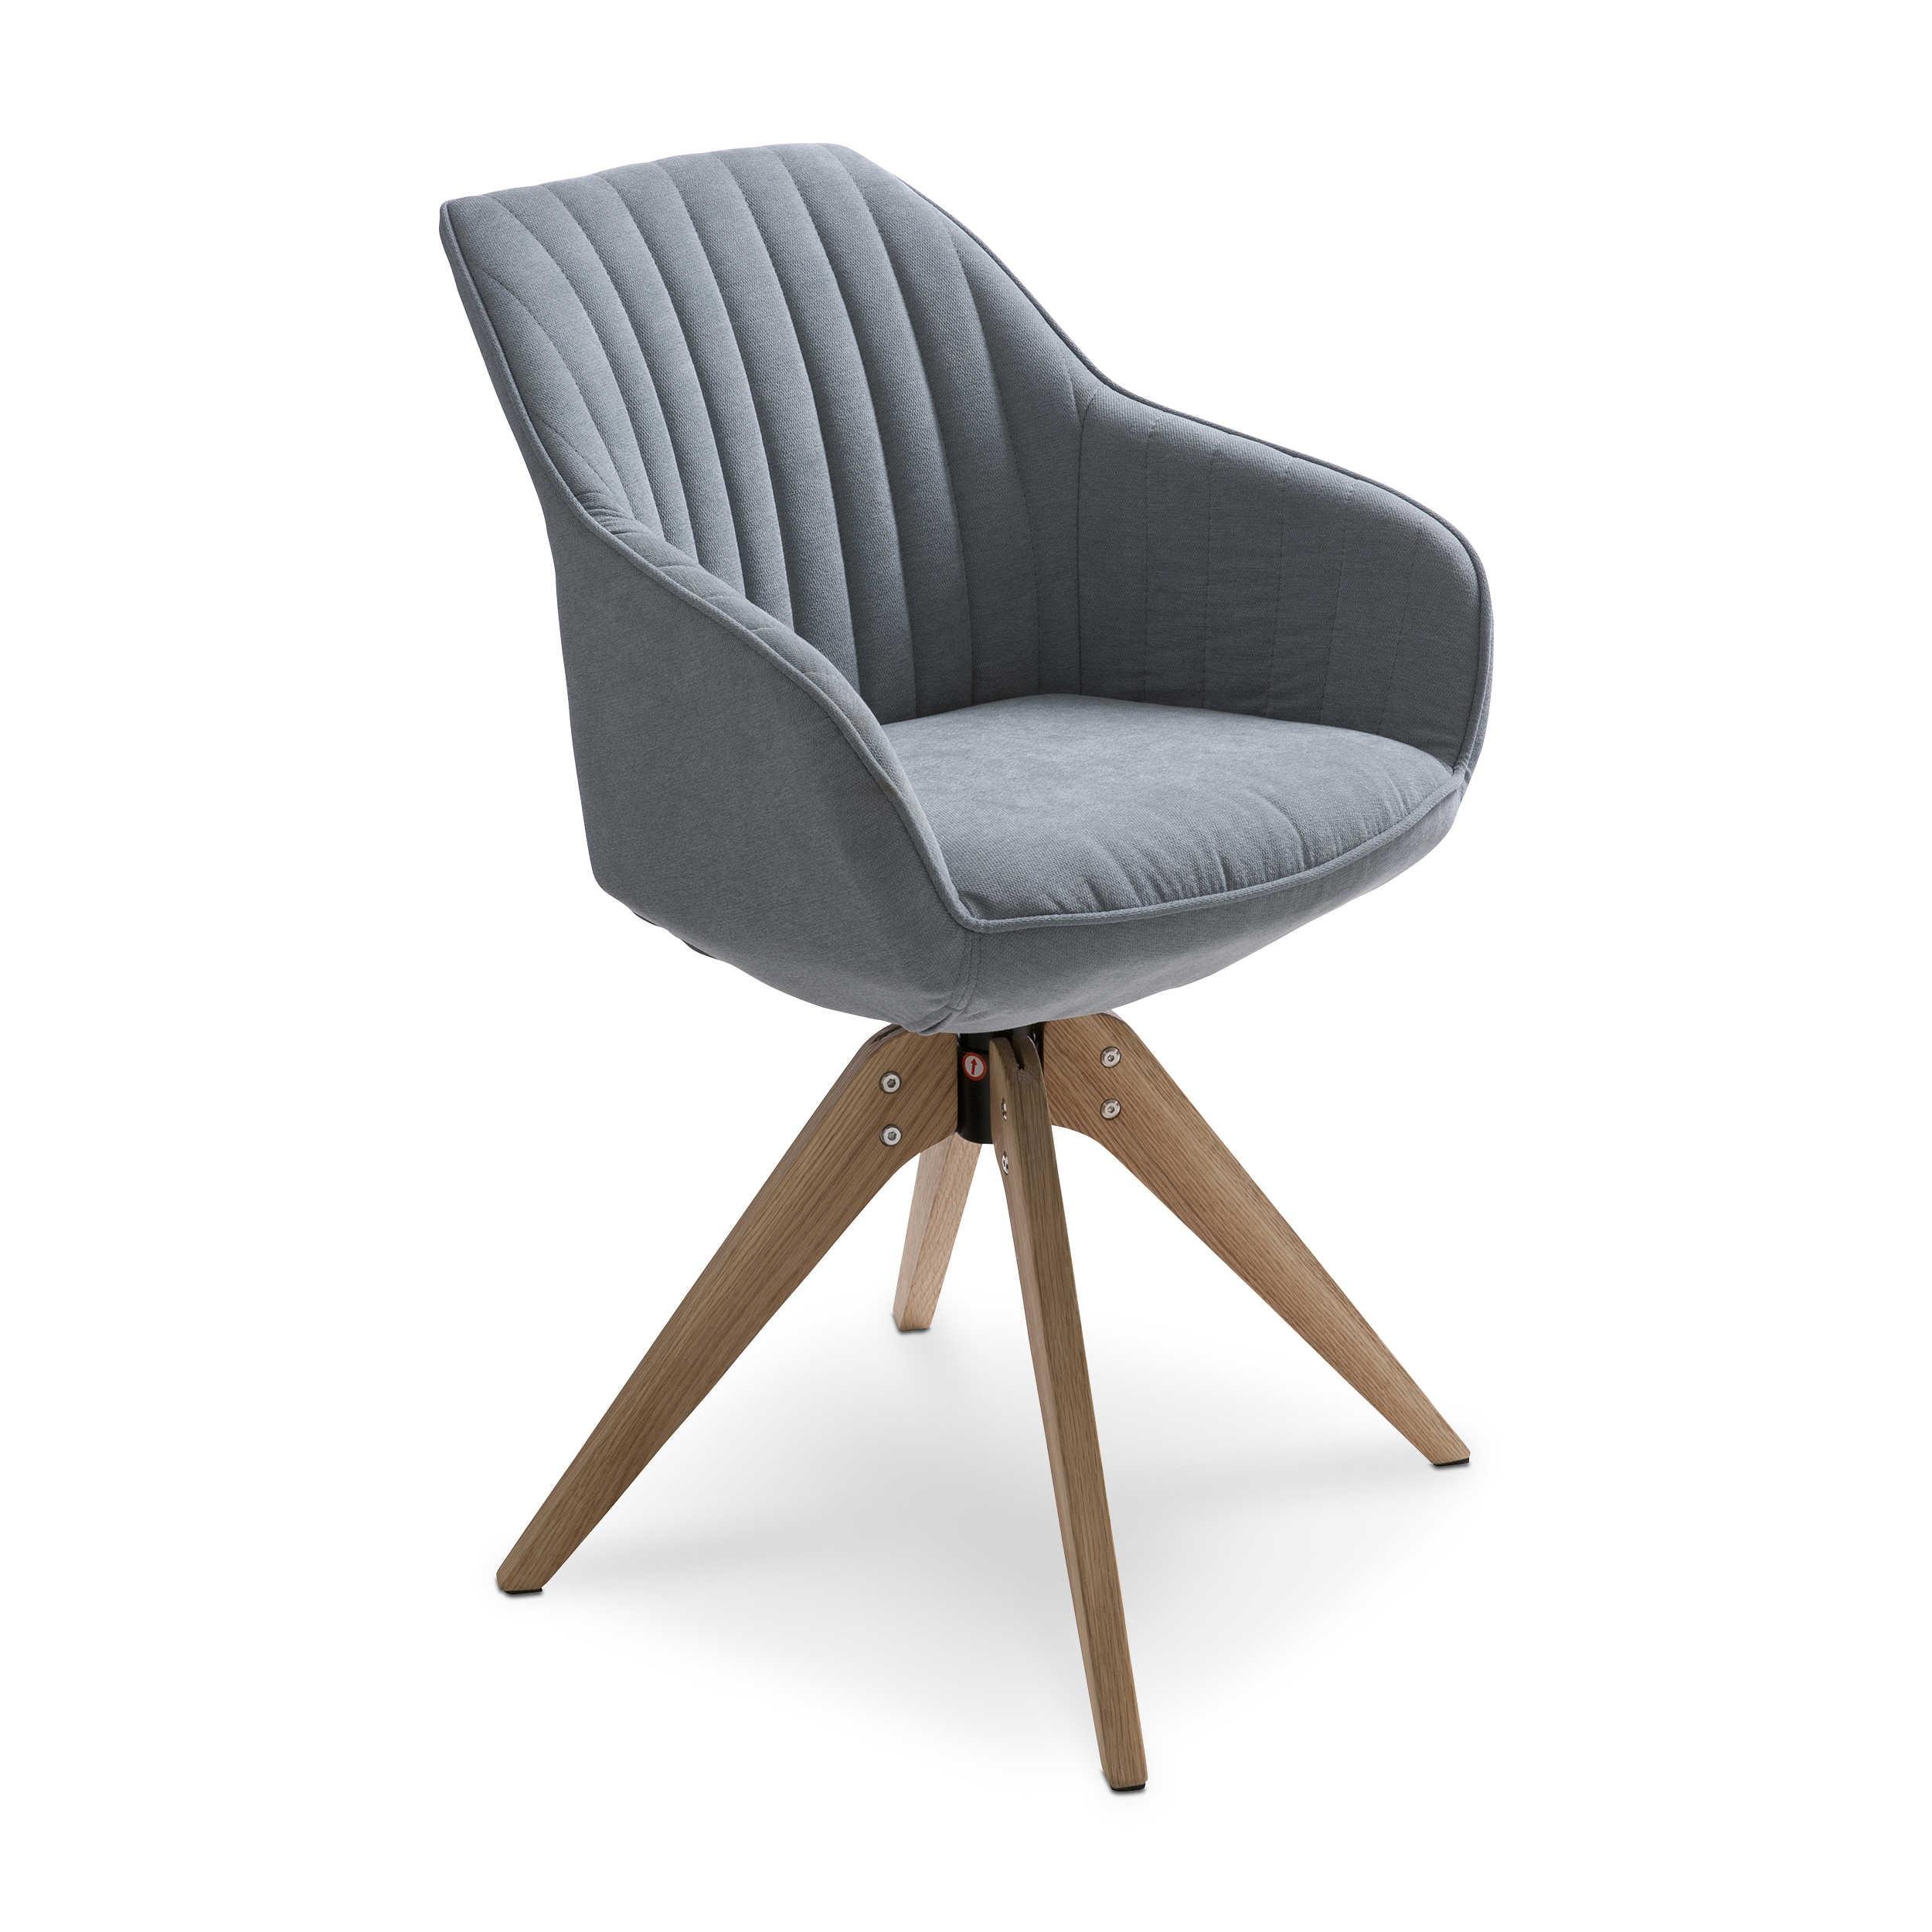 Gutmann Factory Sessel Zuhause Image Idee